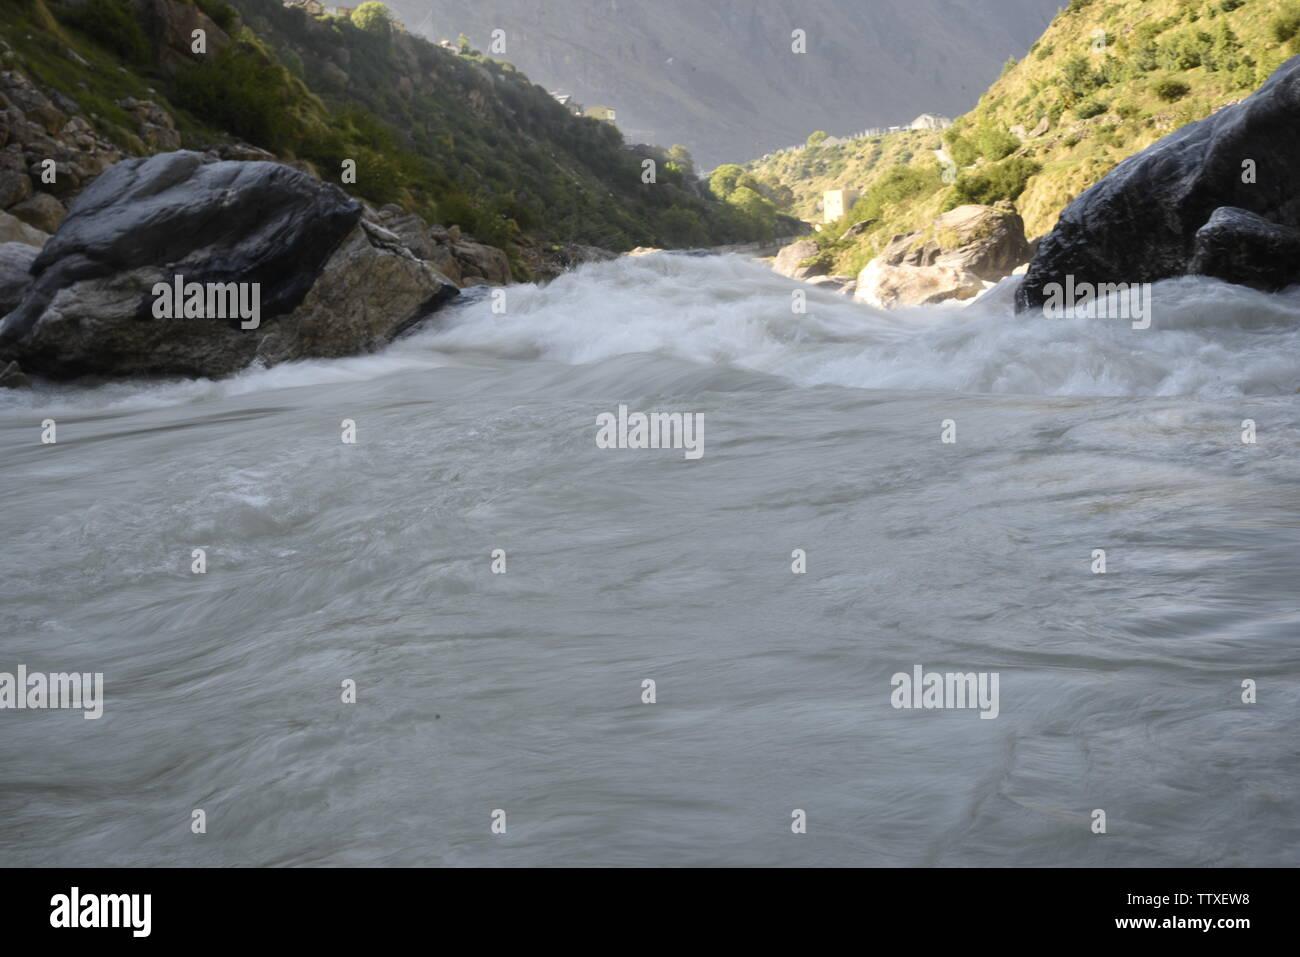 Río Sarasvati santo en la India la última aldea cerca de Maná , Badrniath Chamoli, Rudrapryag, India, Asia Foto de stock